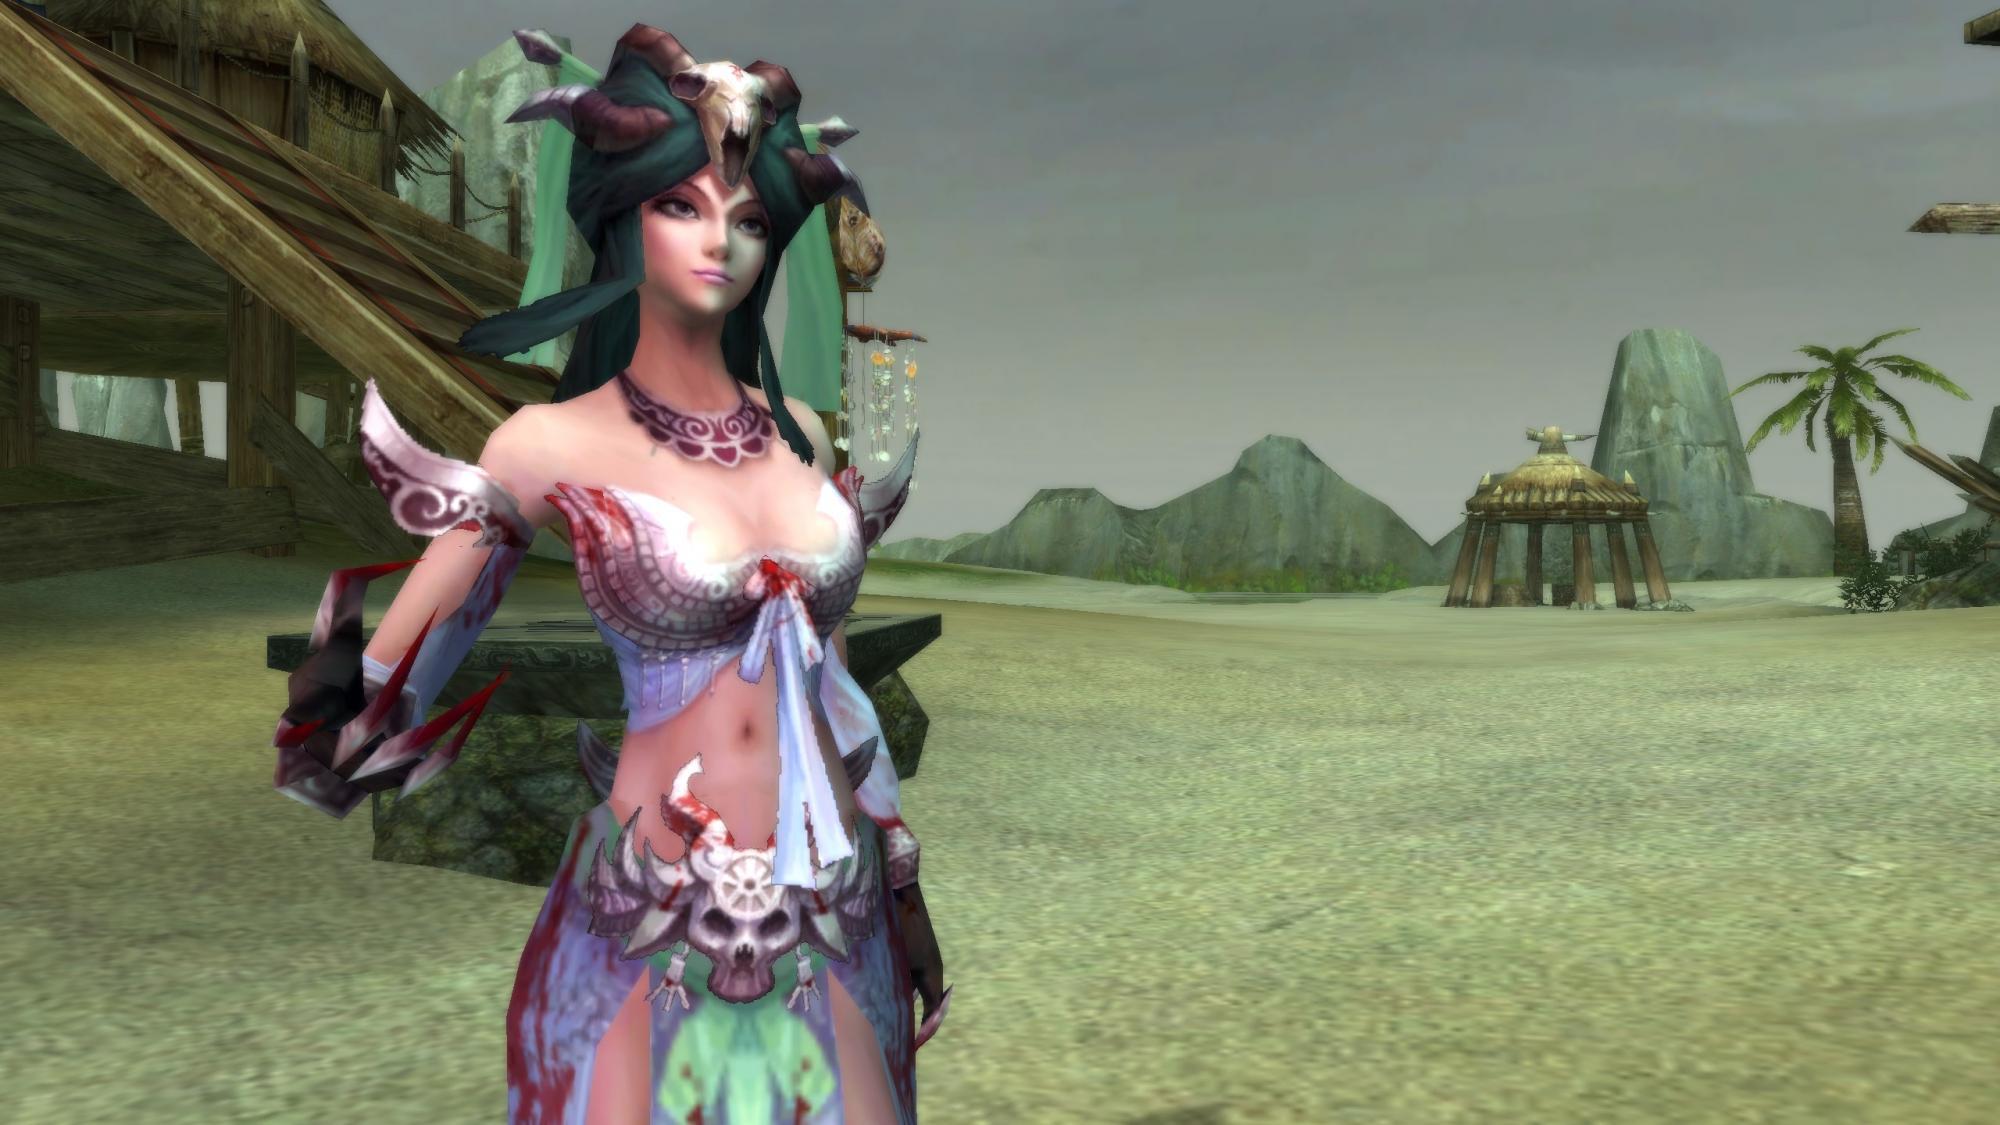 Click image for larger version.Name:Heroes of Three Kingdoms 2.jpgViews:168Size:210.1 KBID:796